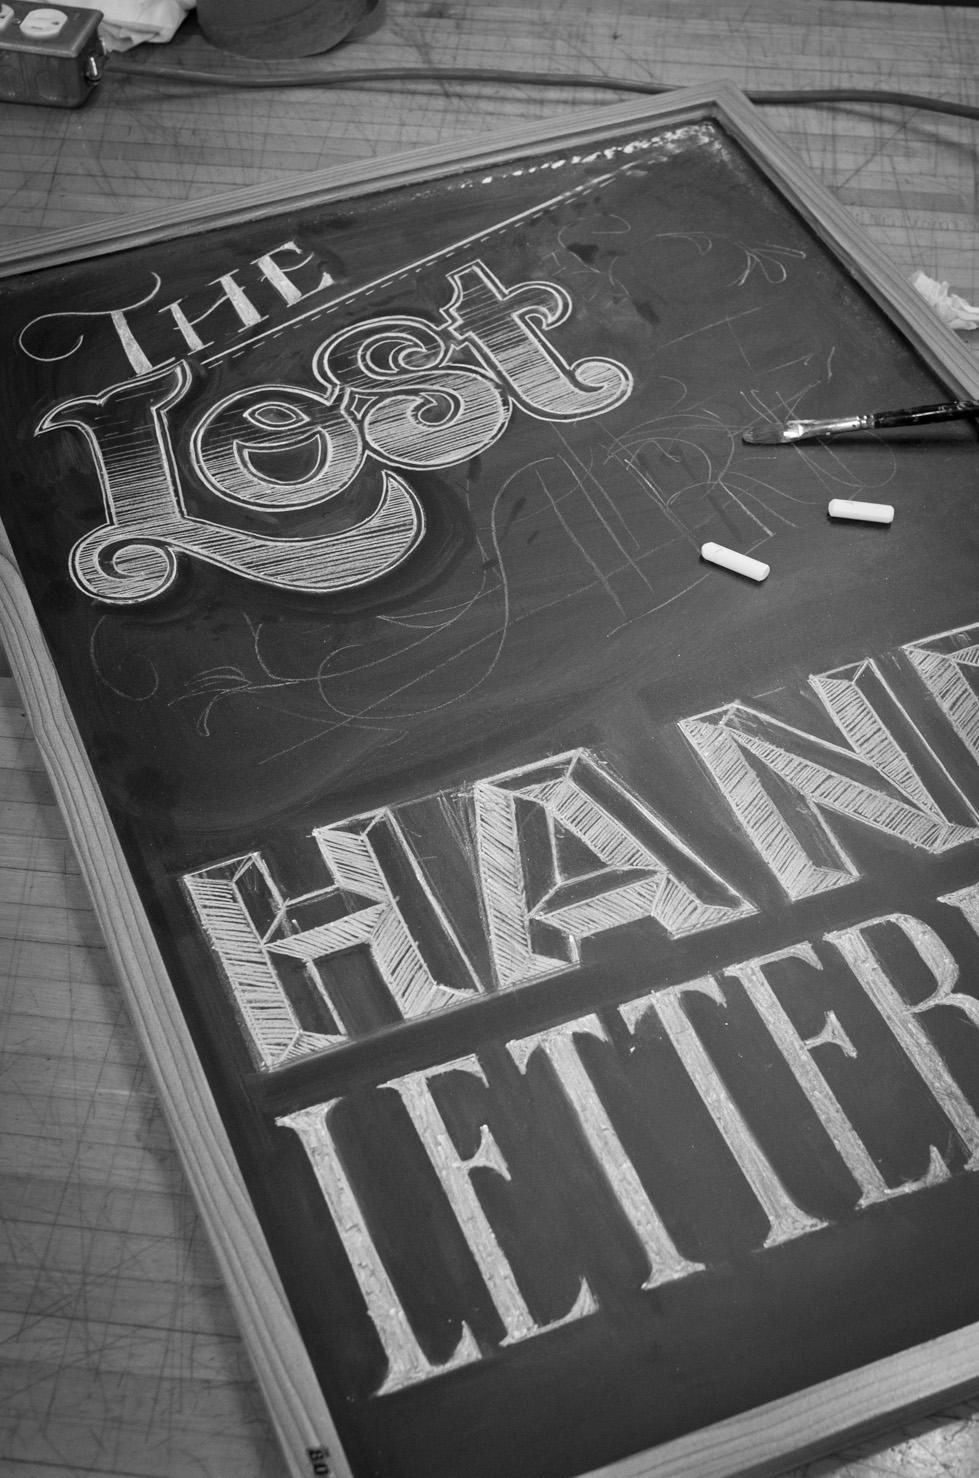 Chalk Lettering Chalkboard brick lettering chalk Signage vintage lost art rustic hand crafted ornate hatched dusty Script